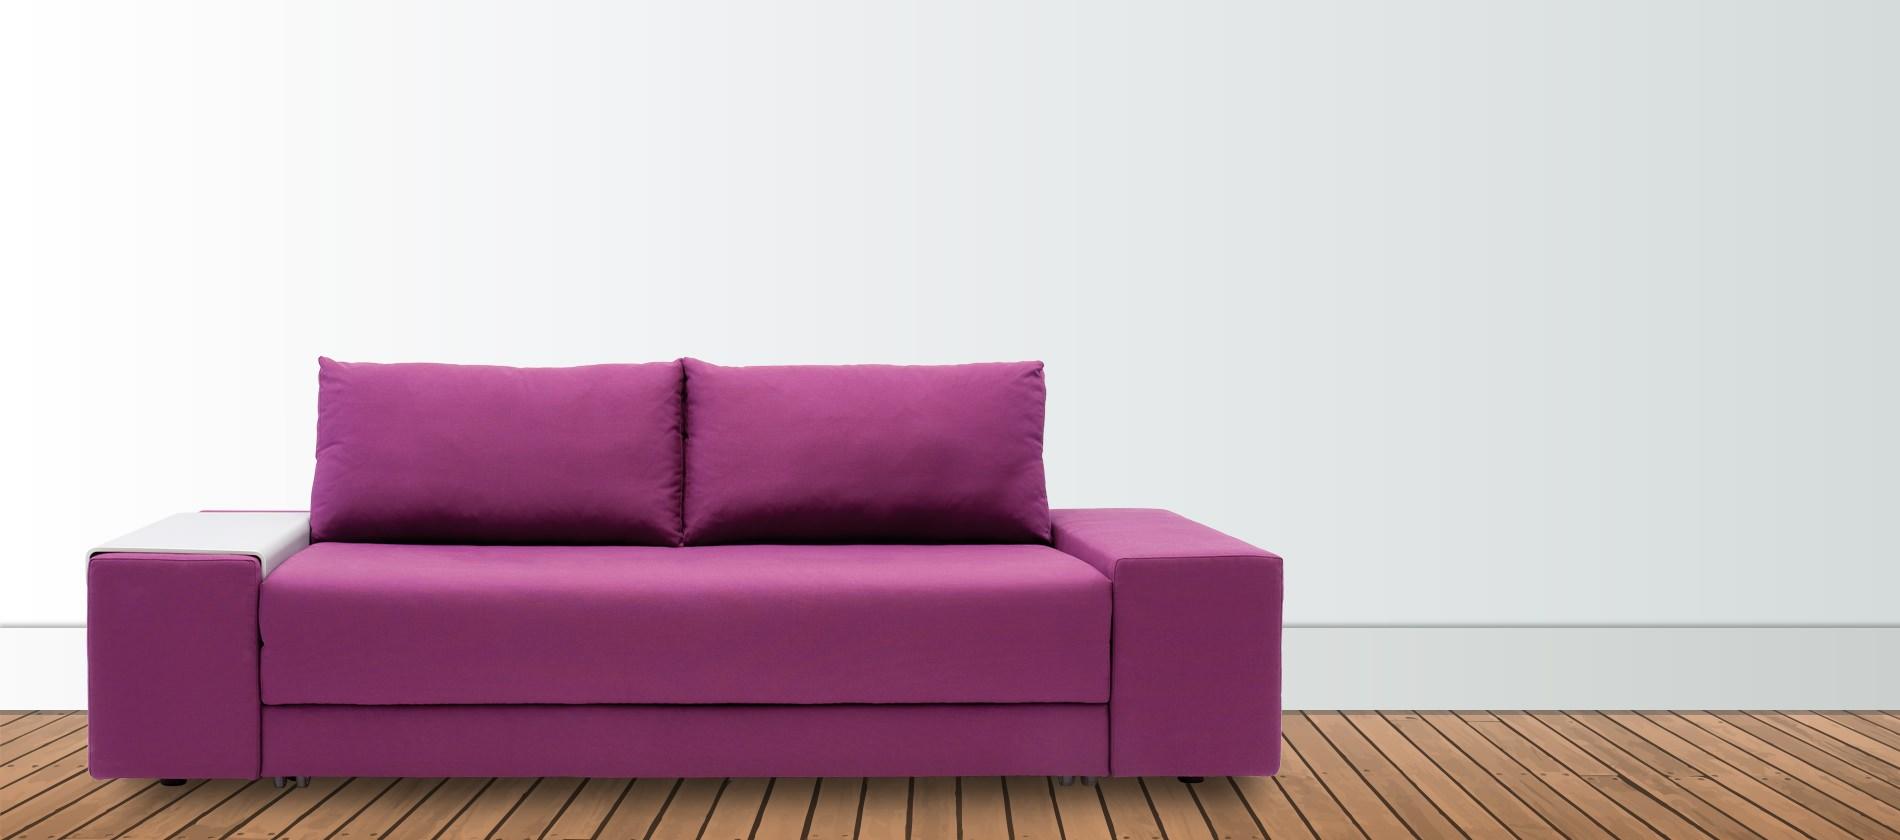 schlafsofa im angebot fabulous gro schlafcouch poco domne. Black Bedroom Furniture Sets. Home Design Ideas